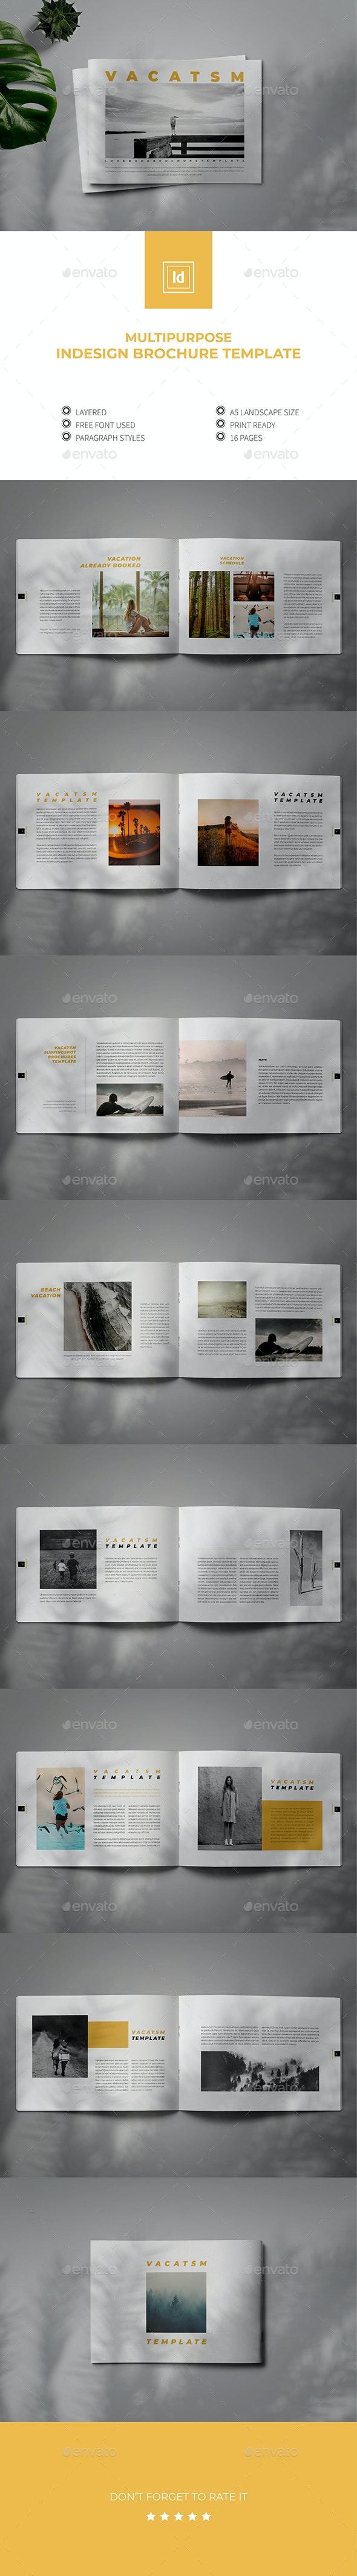 Multipurpose Indesign Brochure Lookbook Template - Brochures Print Templates